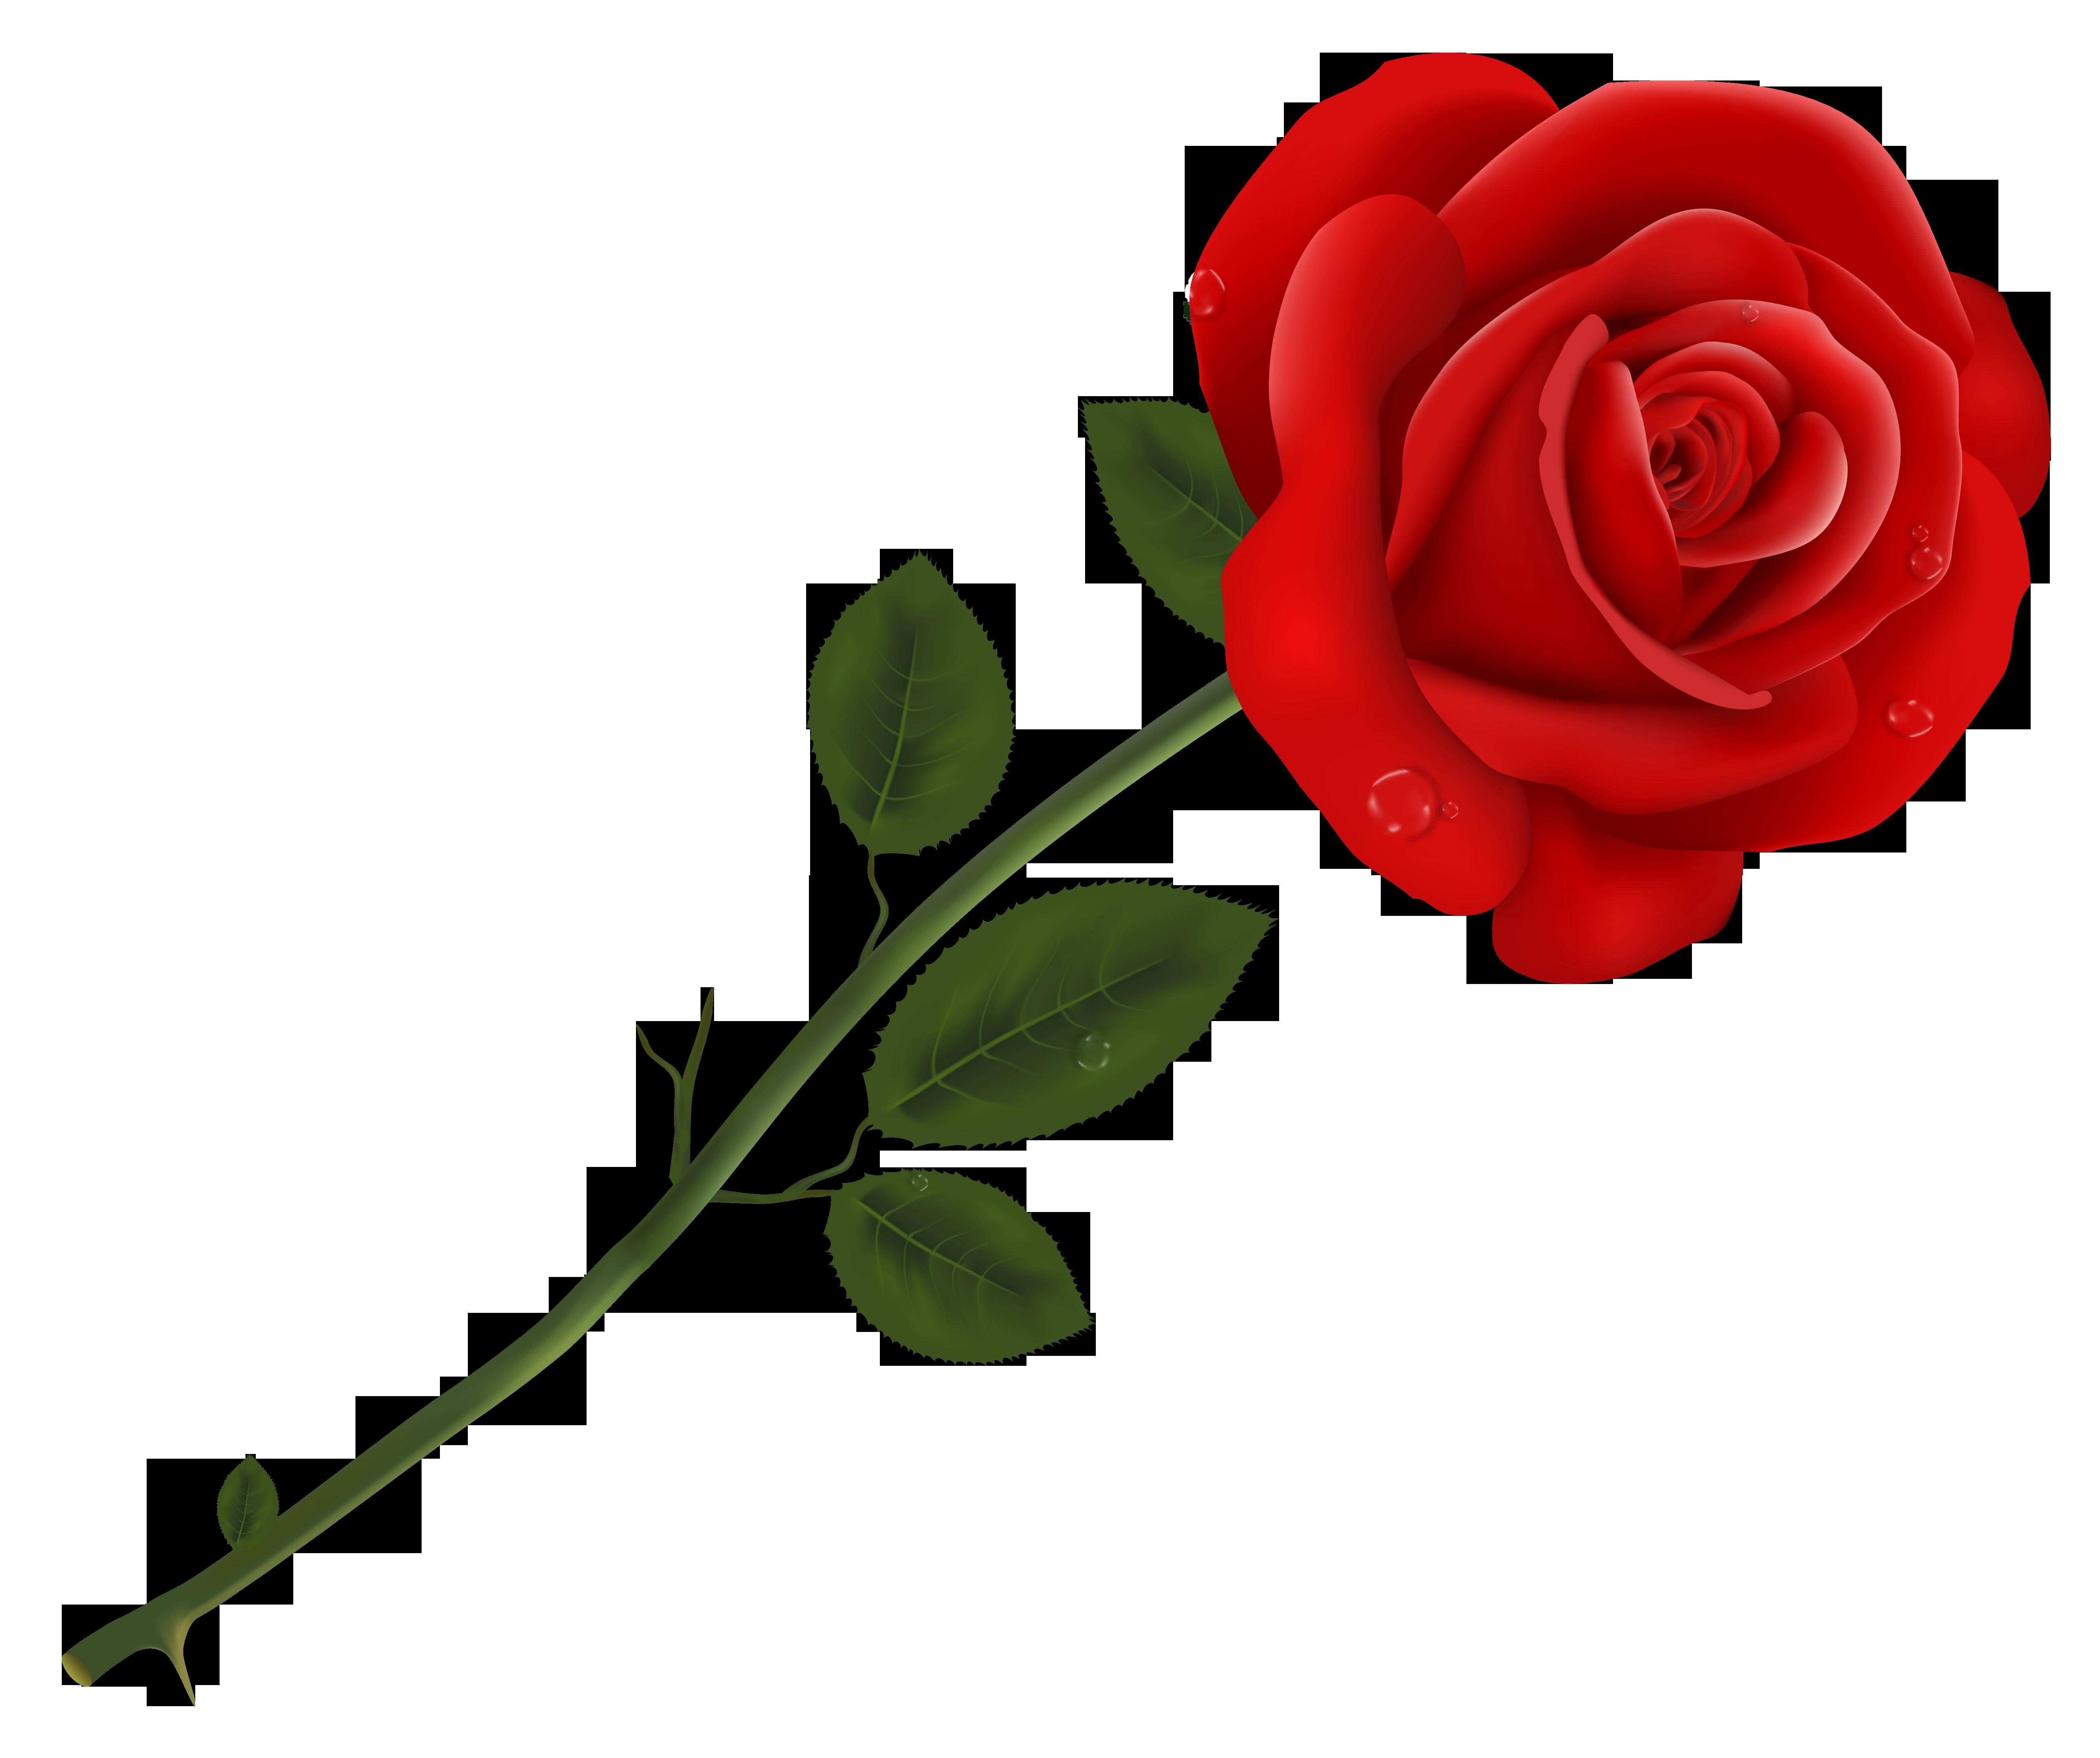 Pin by Ludmila Kolosovskaya on Flowers | Red rose flower ... svg freeuse